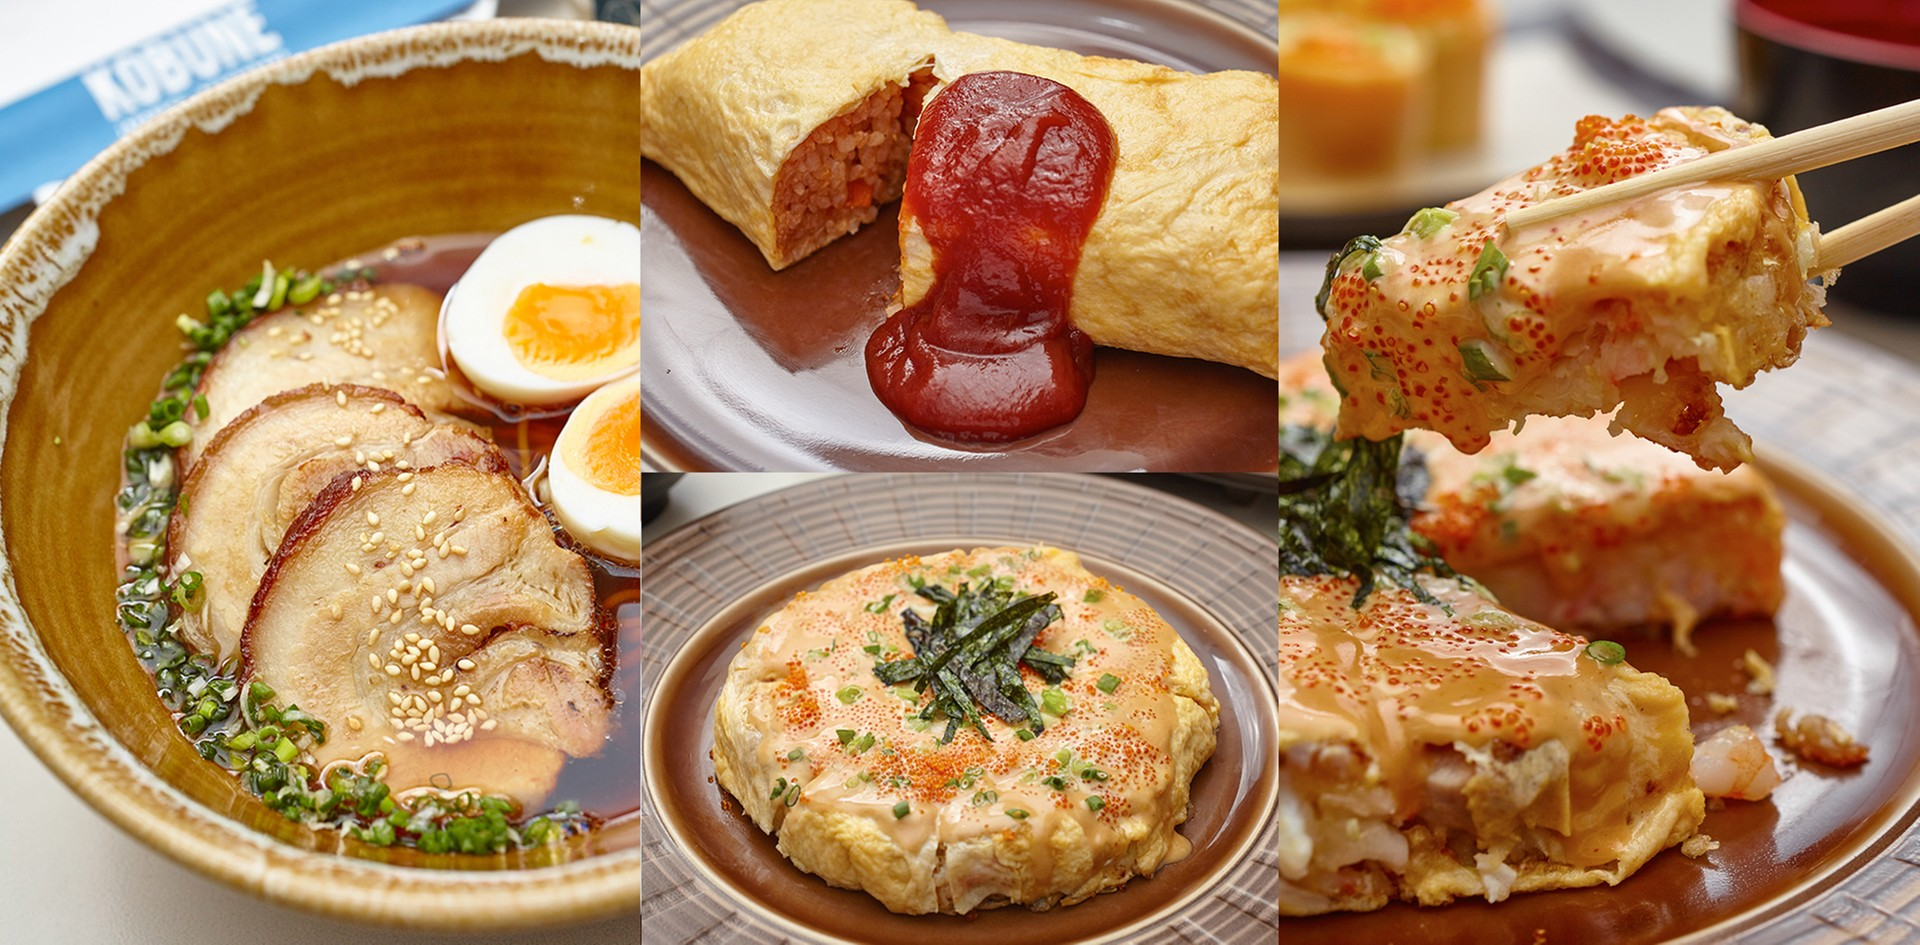 Kobune ชวนฟิน 10 อาหารญี่ปุ่นเมนูใหม่สุดคุ้มรสชาติพรีเมียมราคาสุดชิลล์